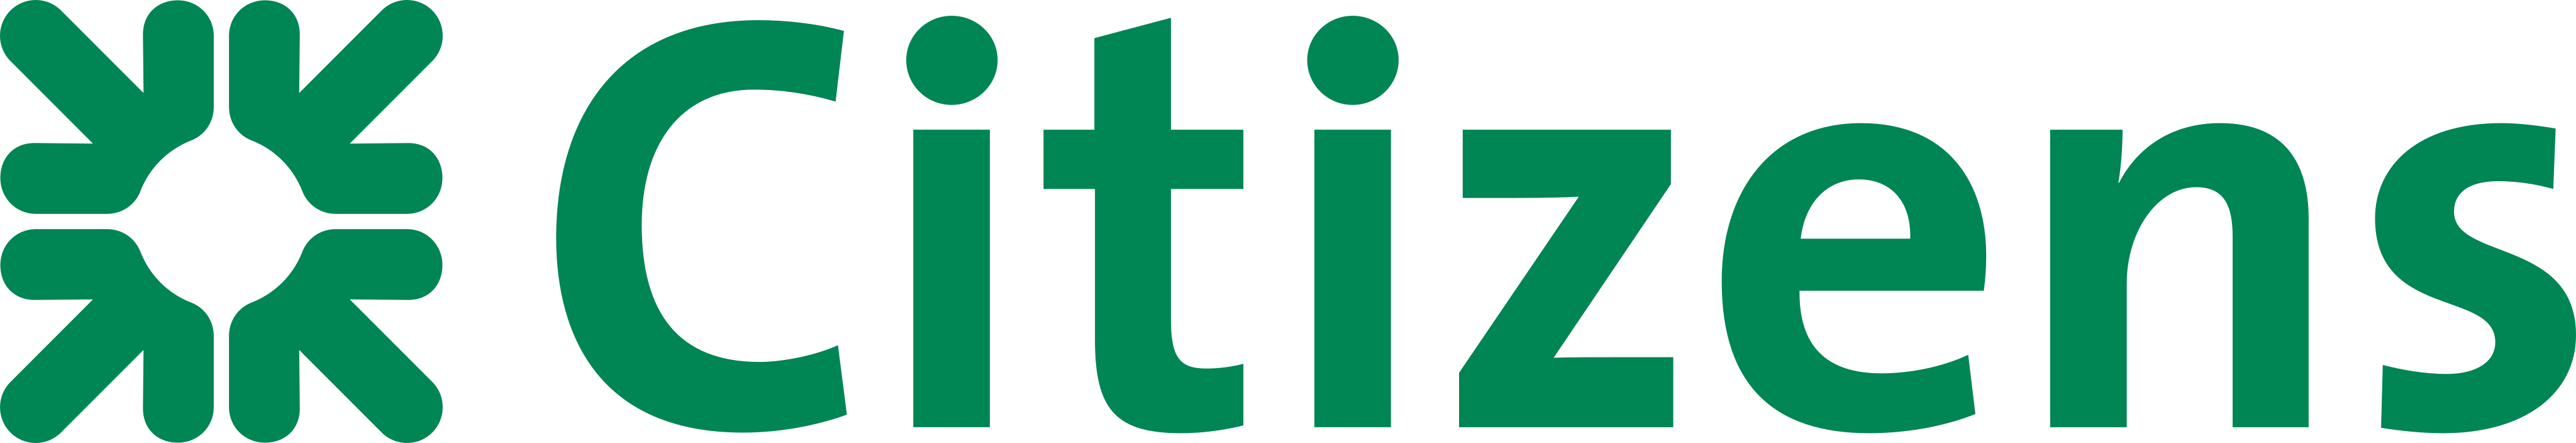 citizens logo - Citizens Bank Logo